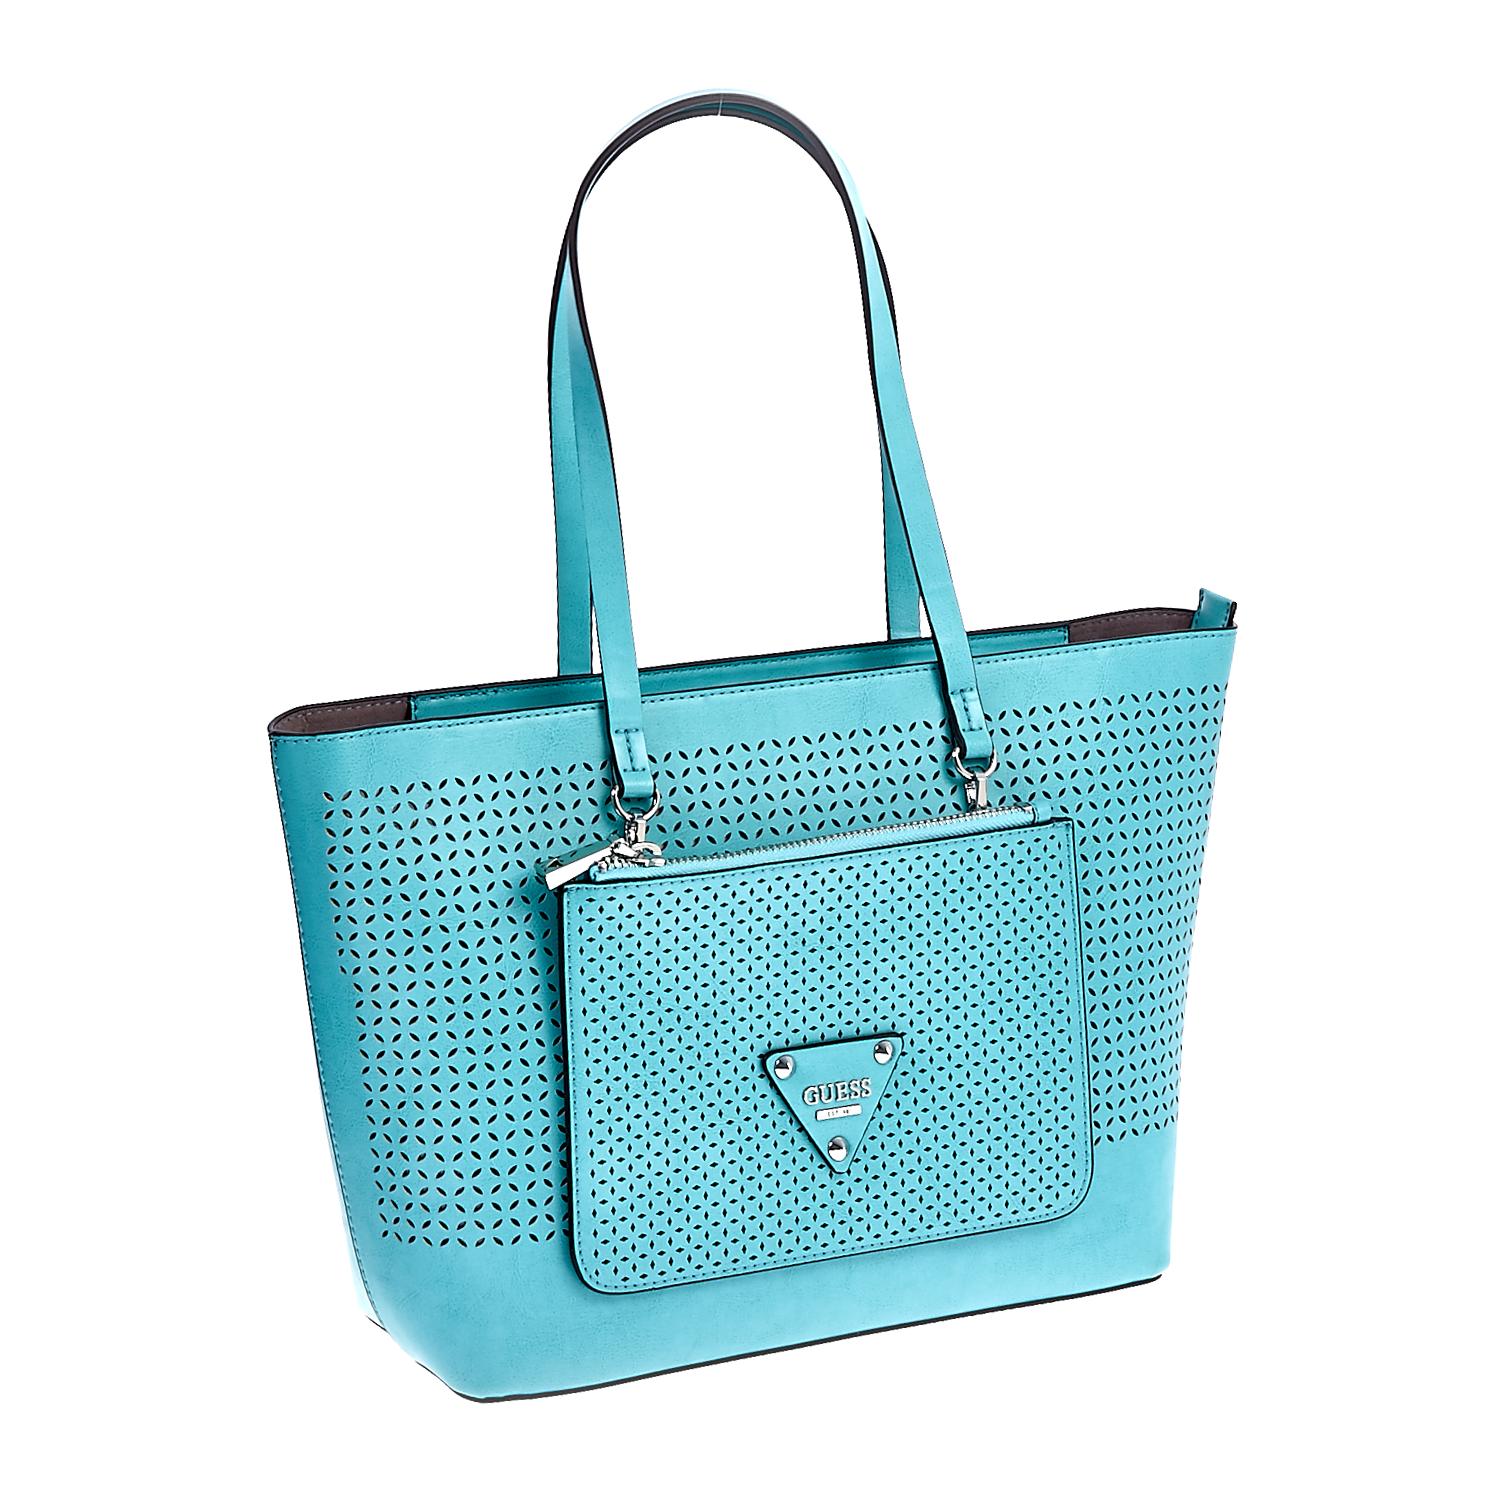 GUESS – Γυναικεία τσάντα Guess μπλε 1445909.0-0031